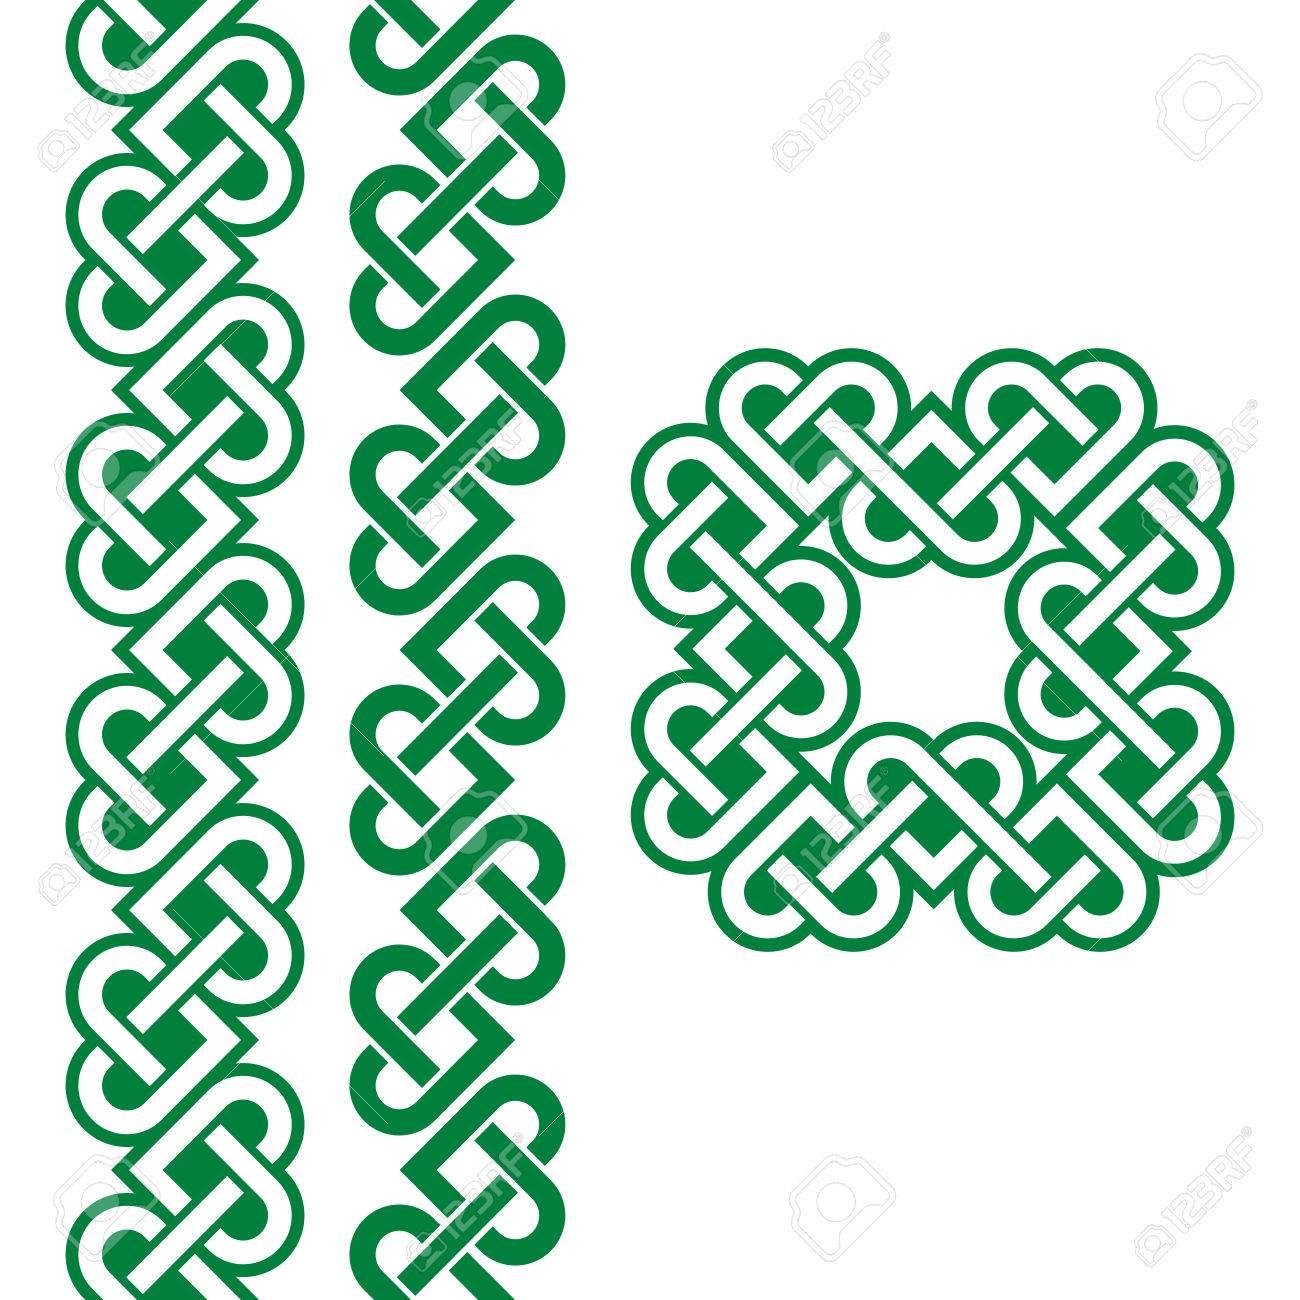 Irish Patterns New Ideas